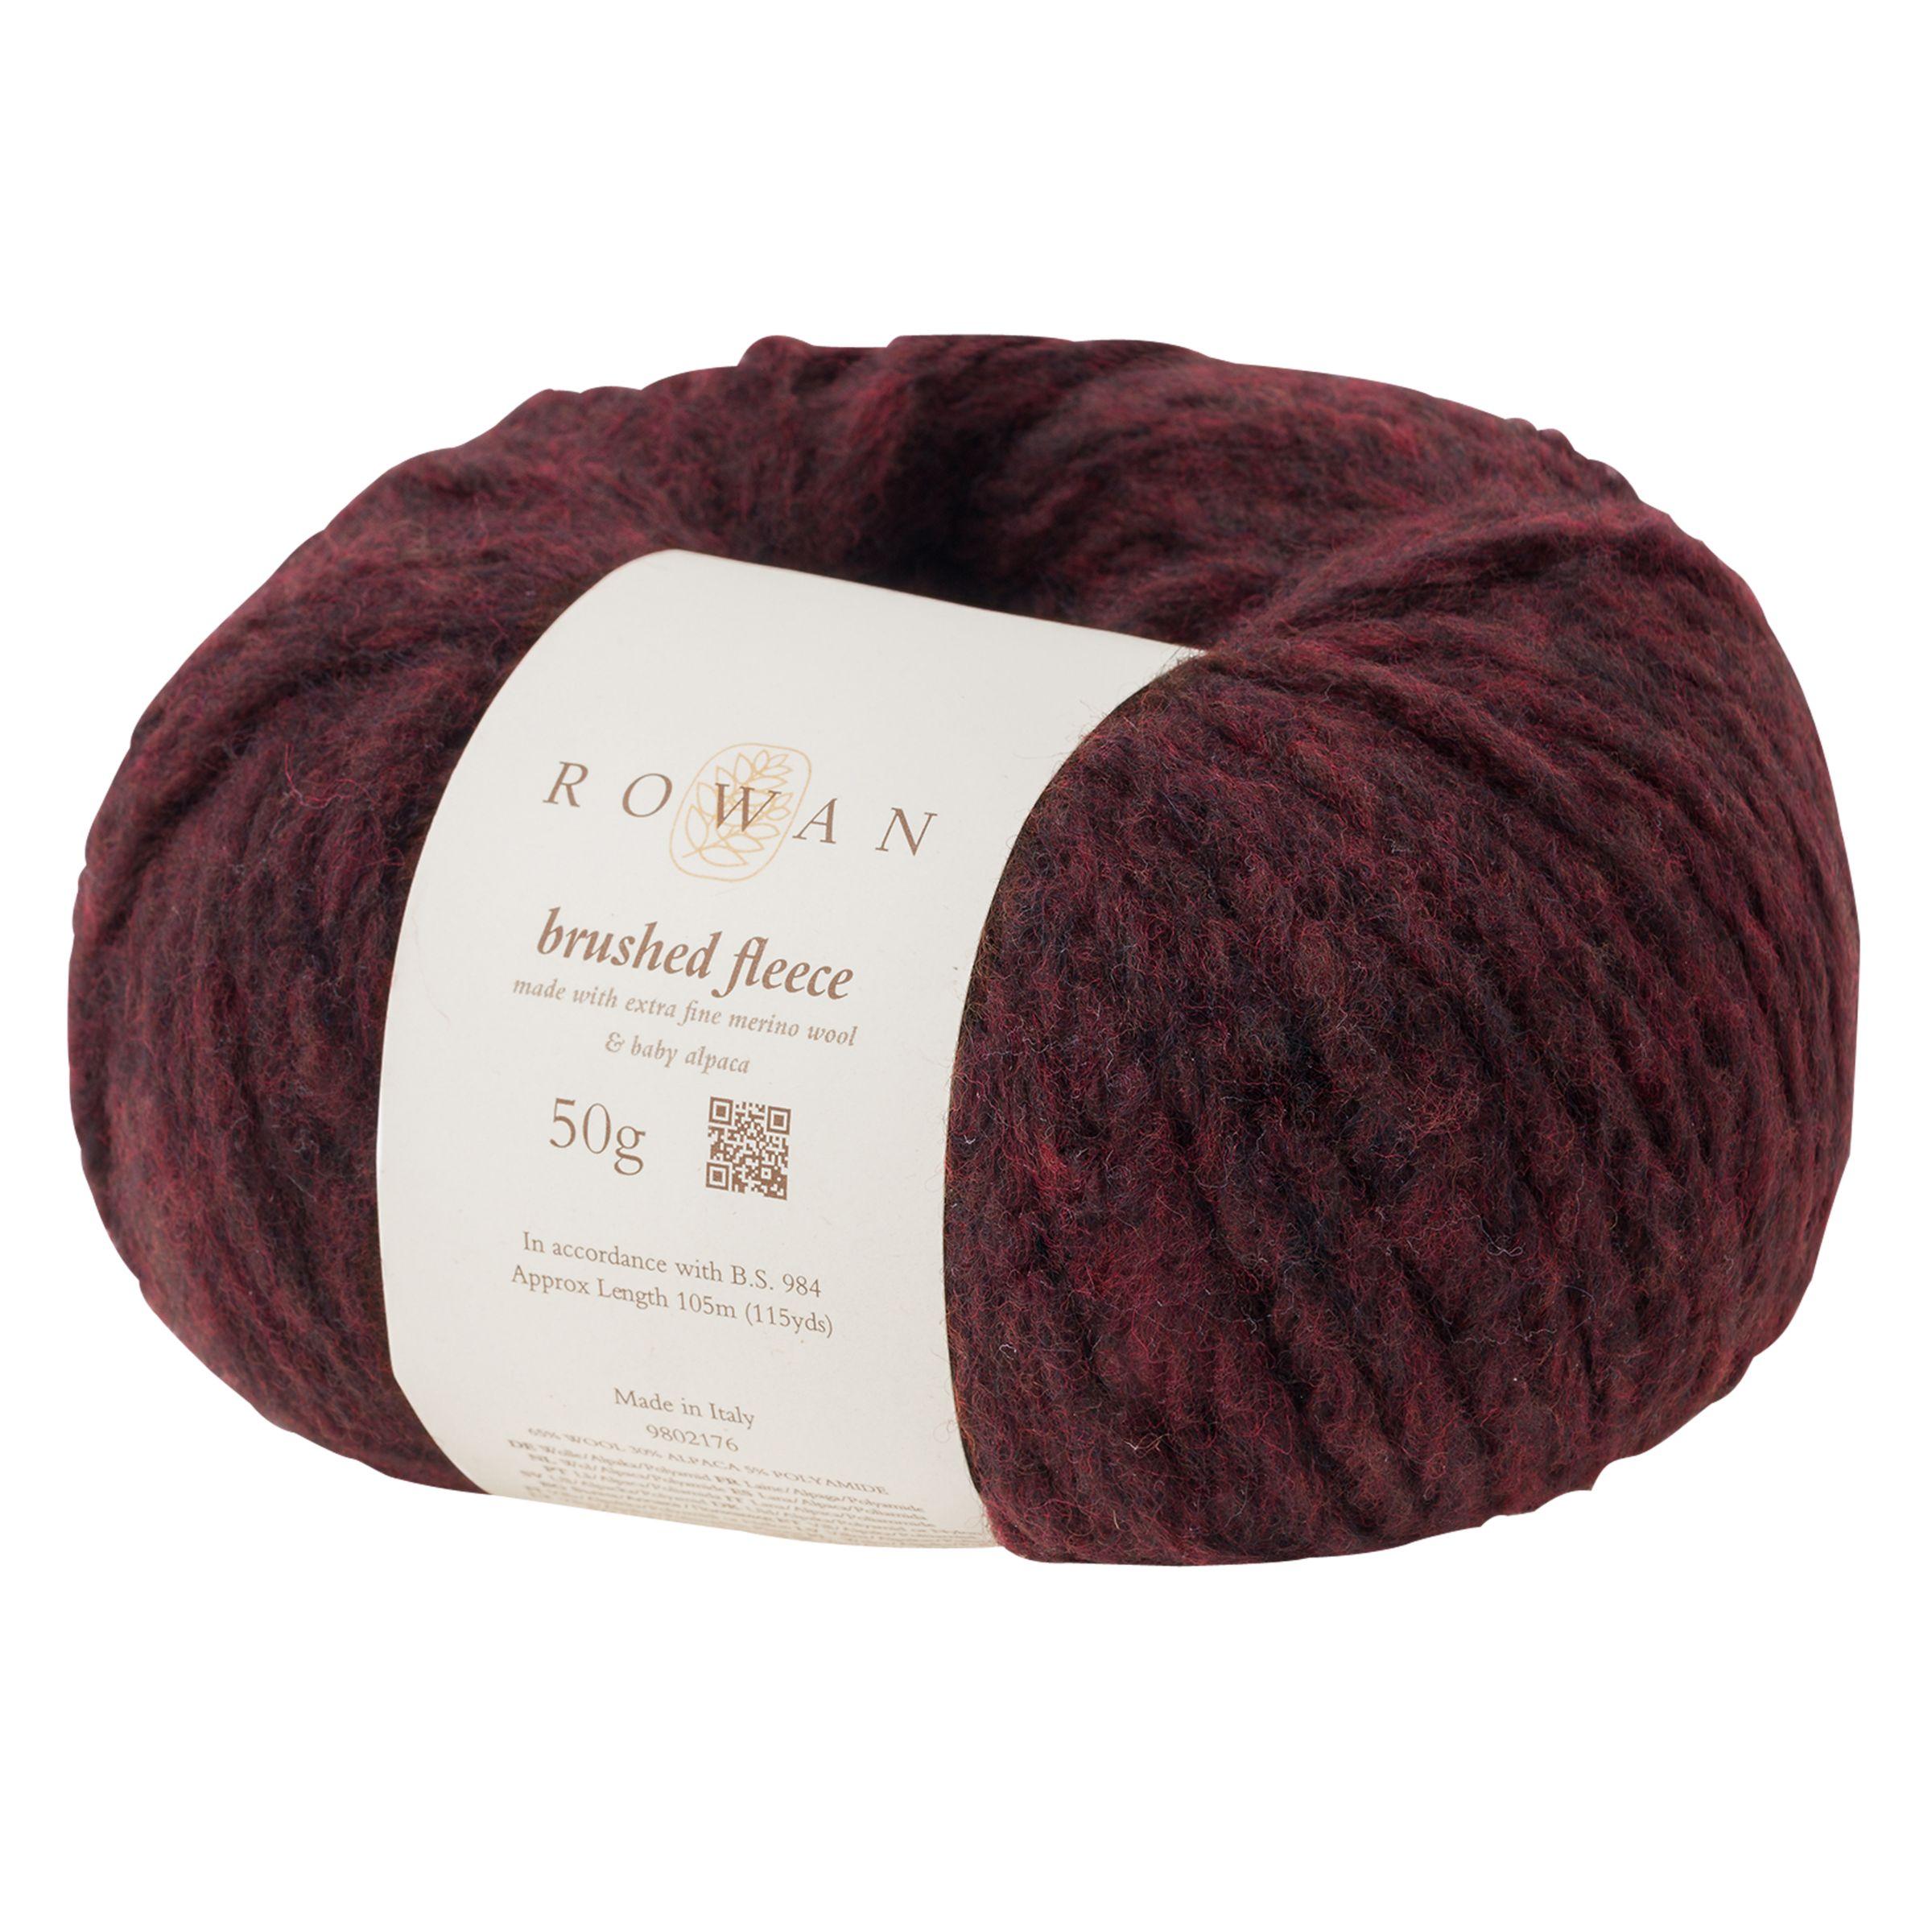 Rowan Rowan Brushed Fleece Chunky Yarn, 50g